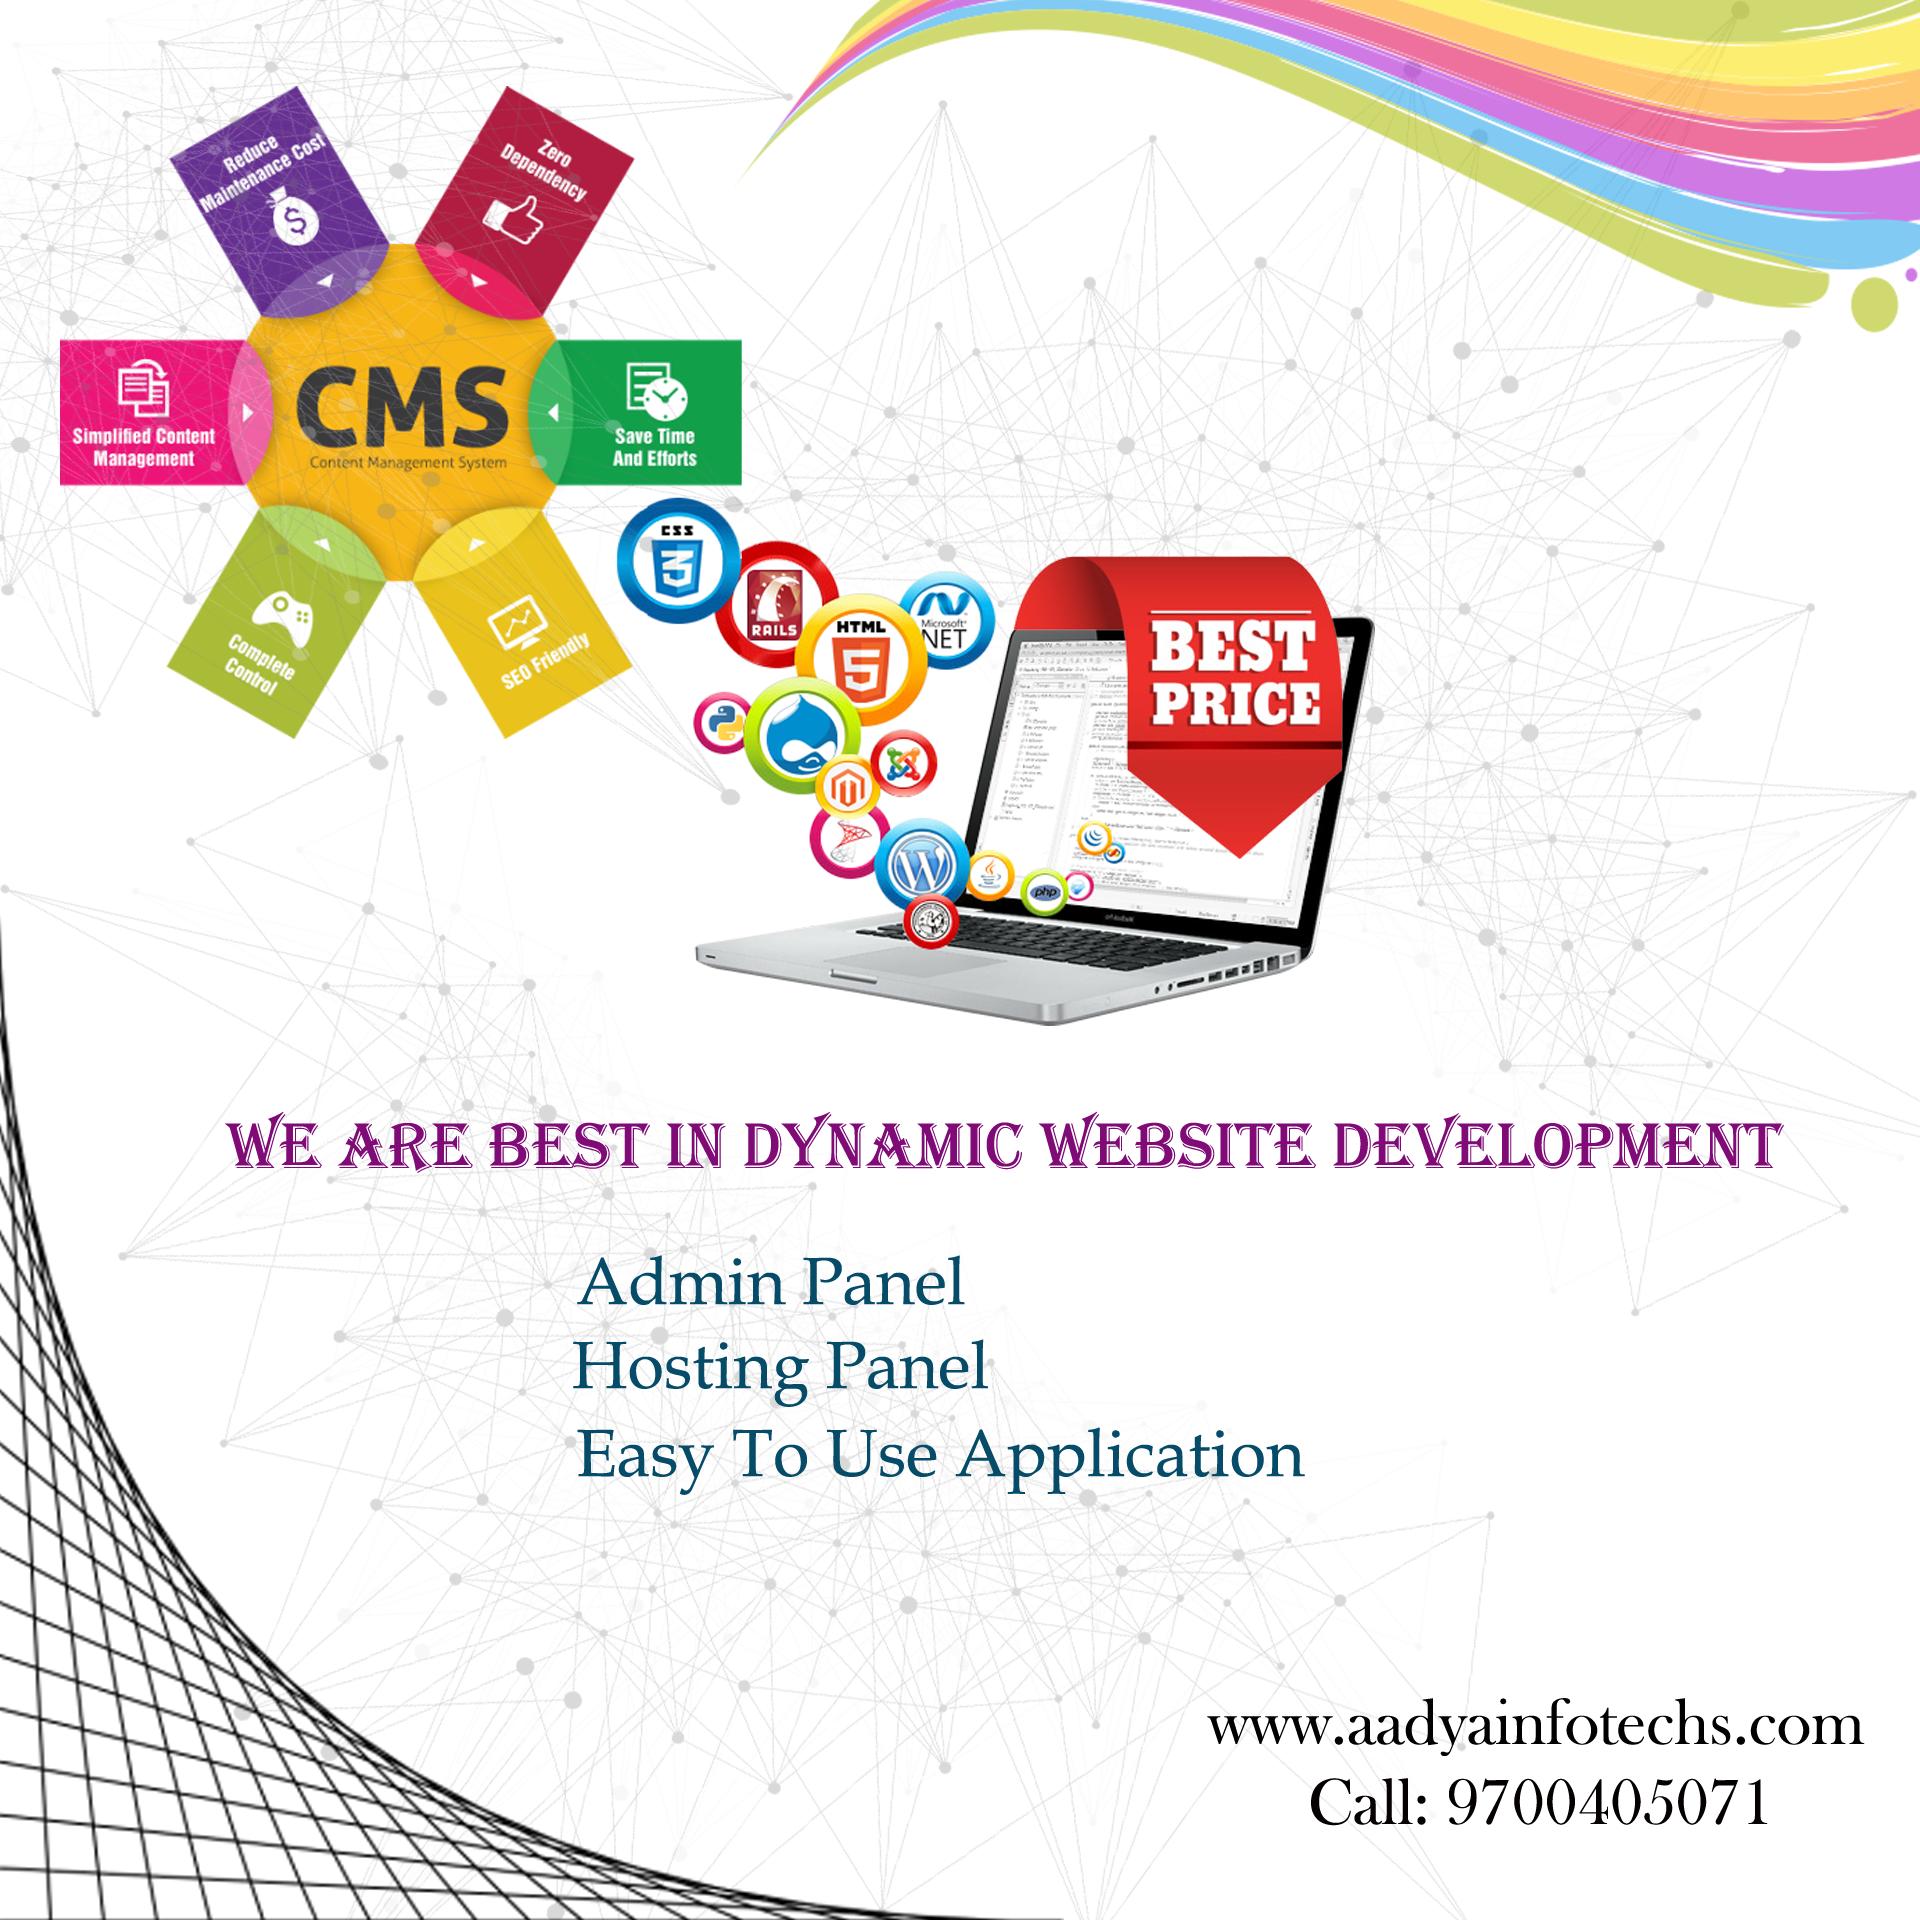 Best Web Designing Company In Hyderabad Aadyainfotechs Custom Web Design Web Design App Development Companies